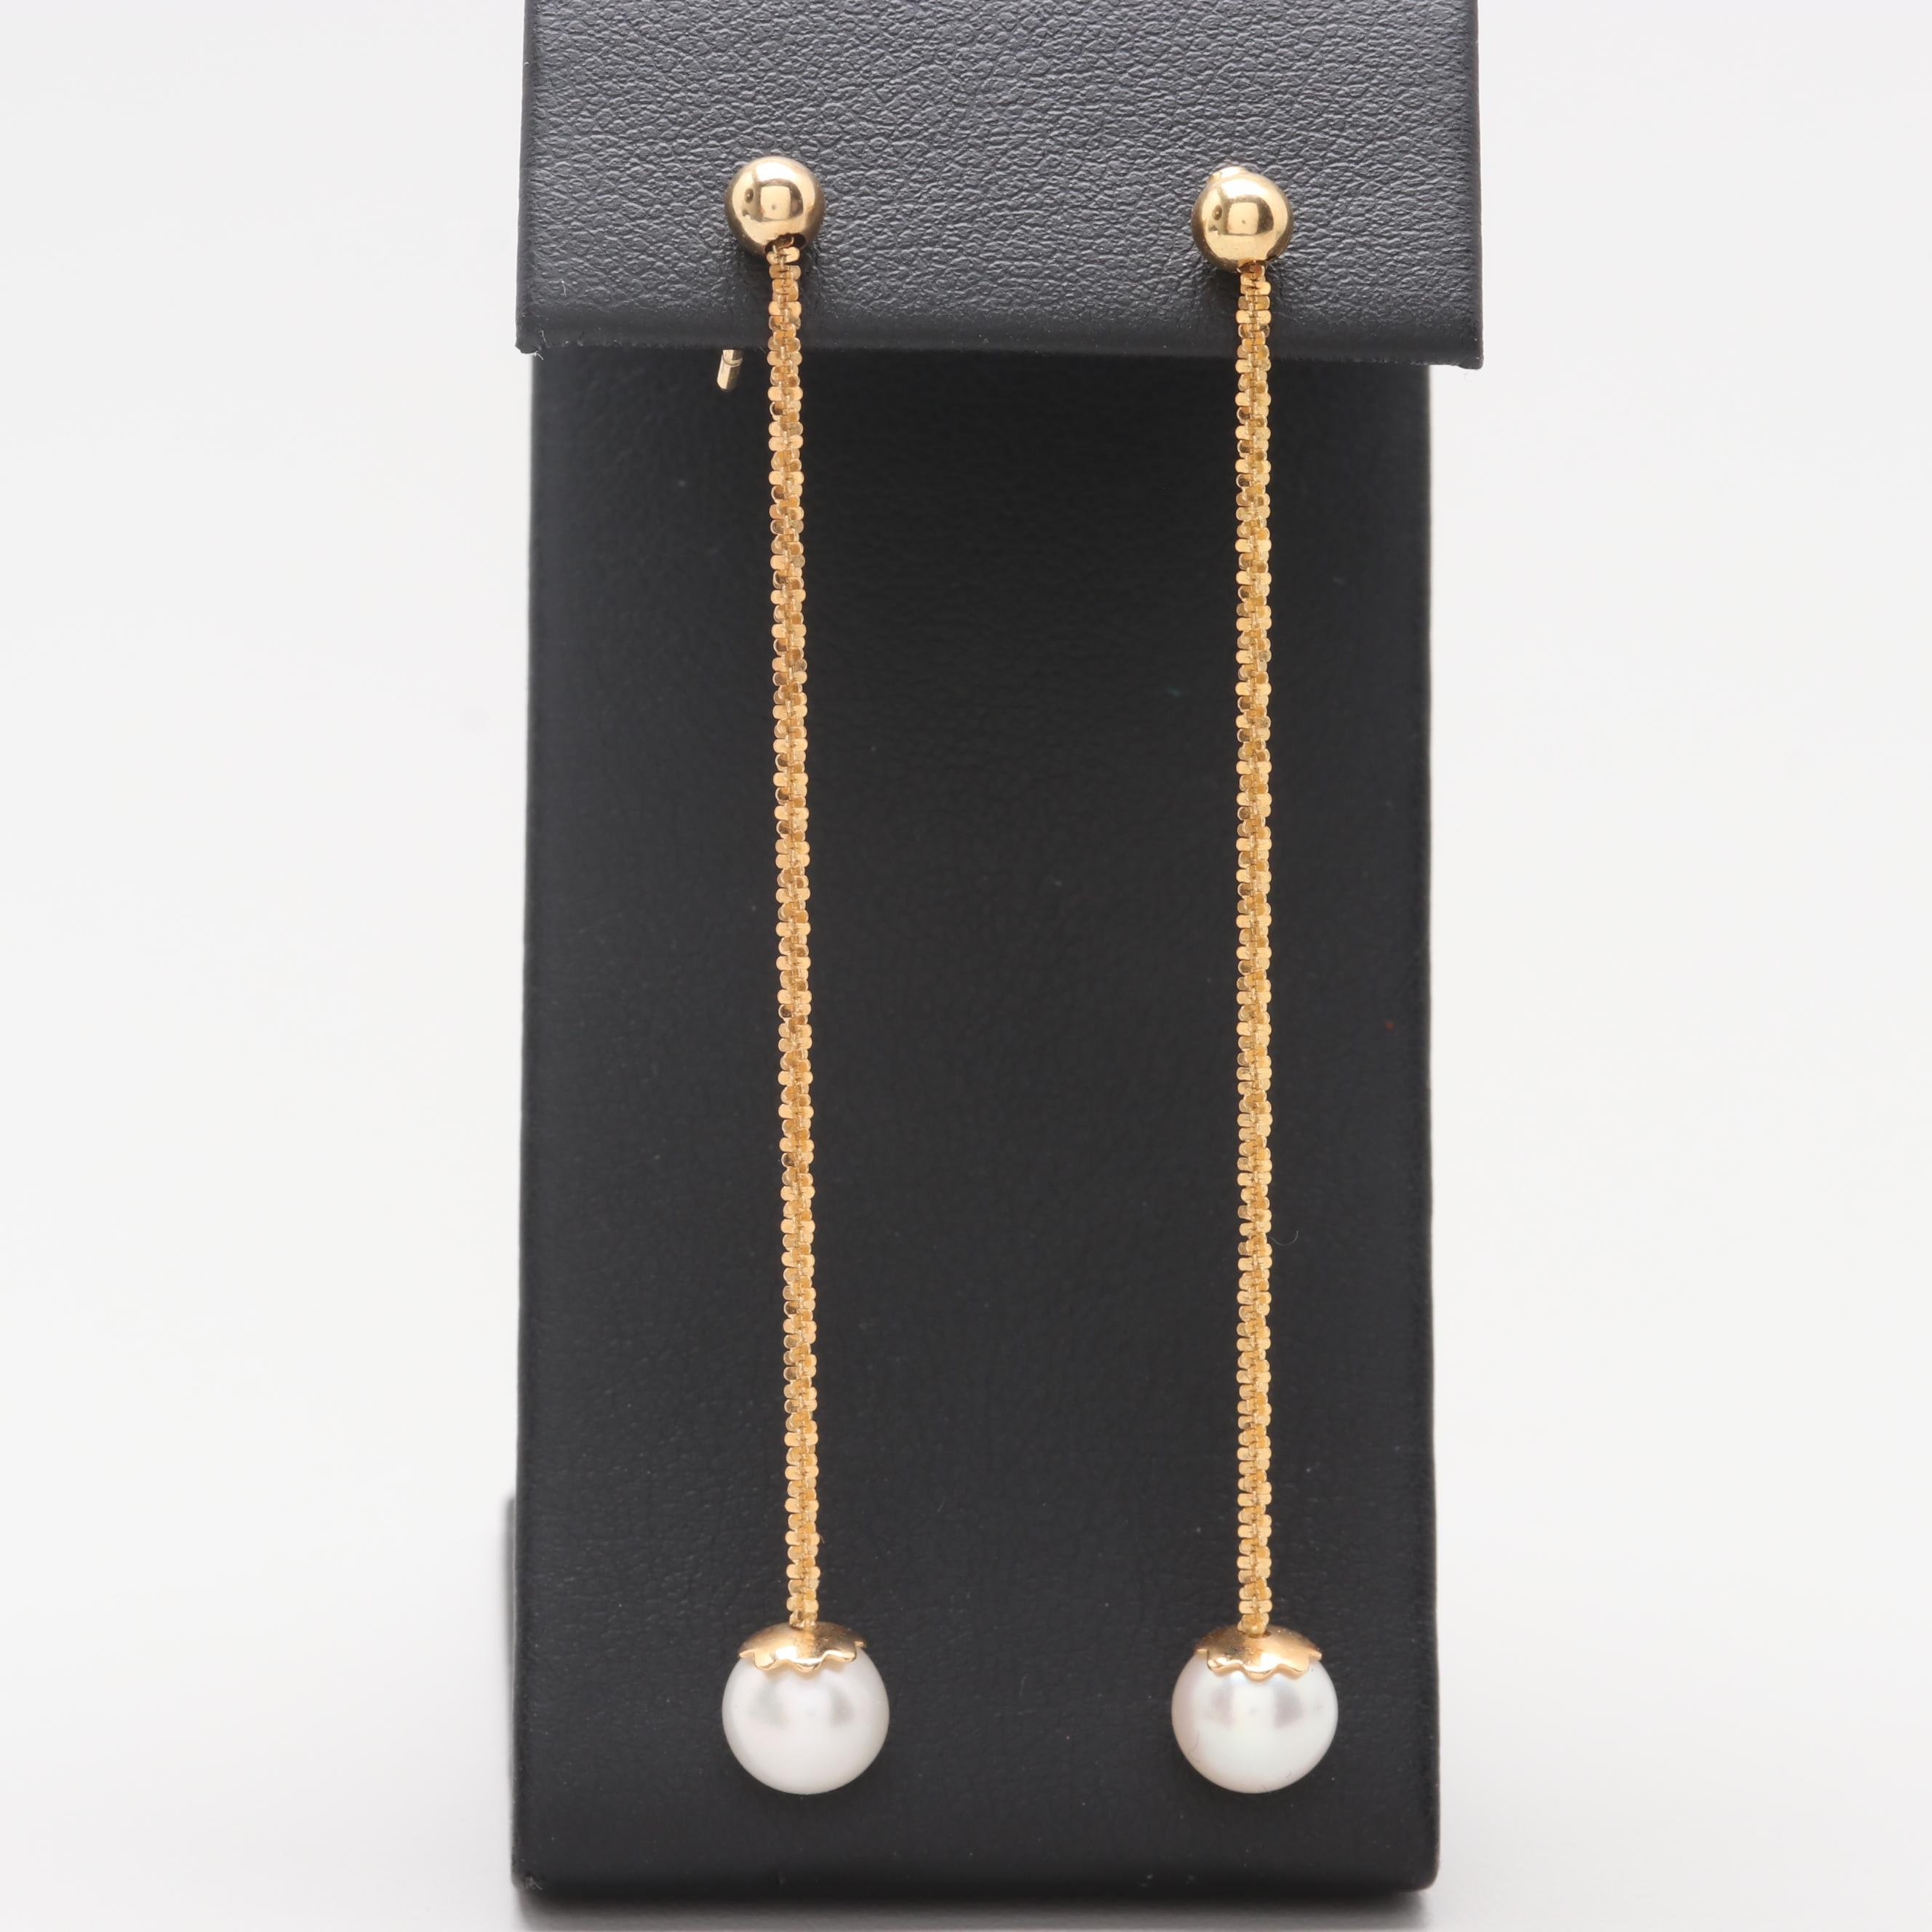 Milor 14K Yellow Gold Cultured Pearl Earrings